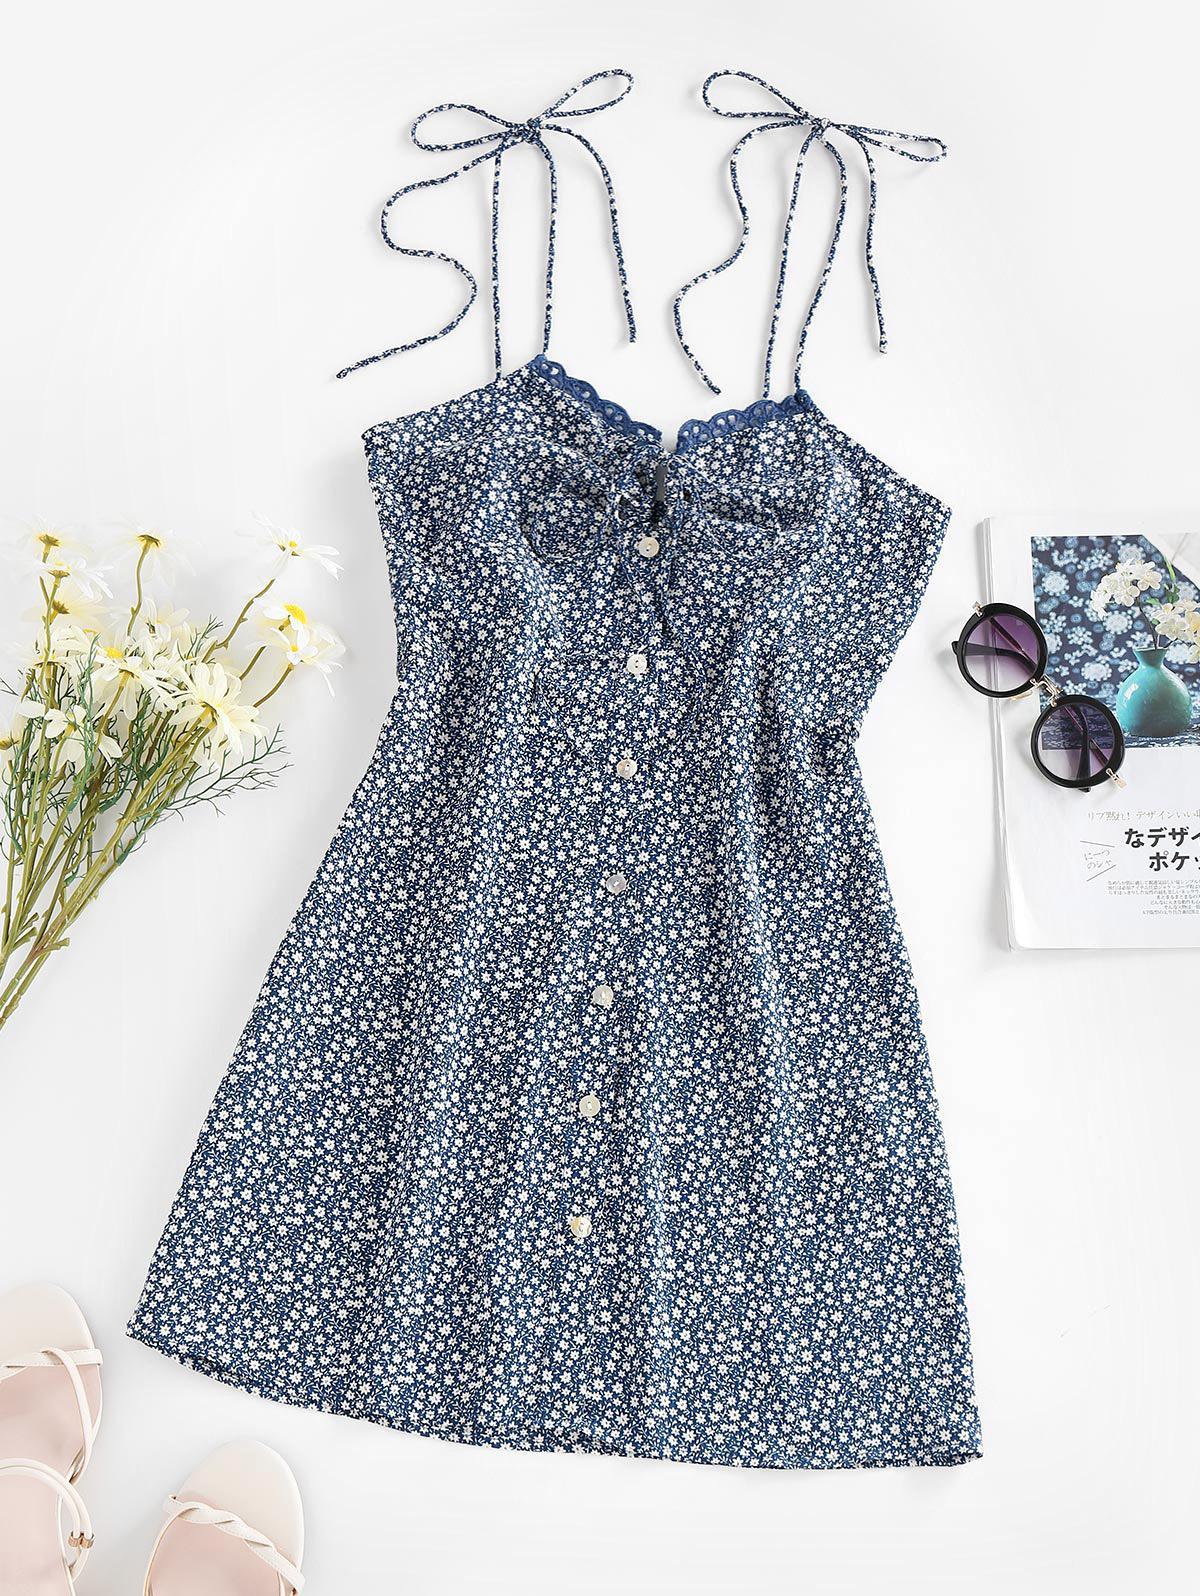 ZAFUL Lace Up Keyhole Floral Mini Dress